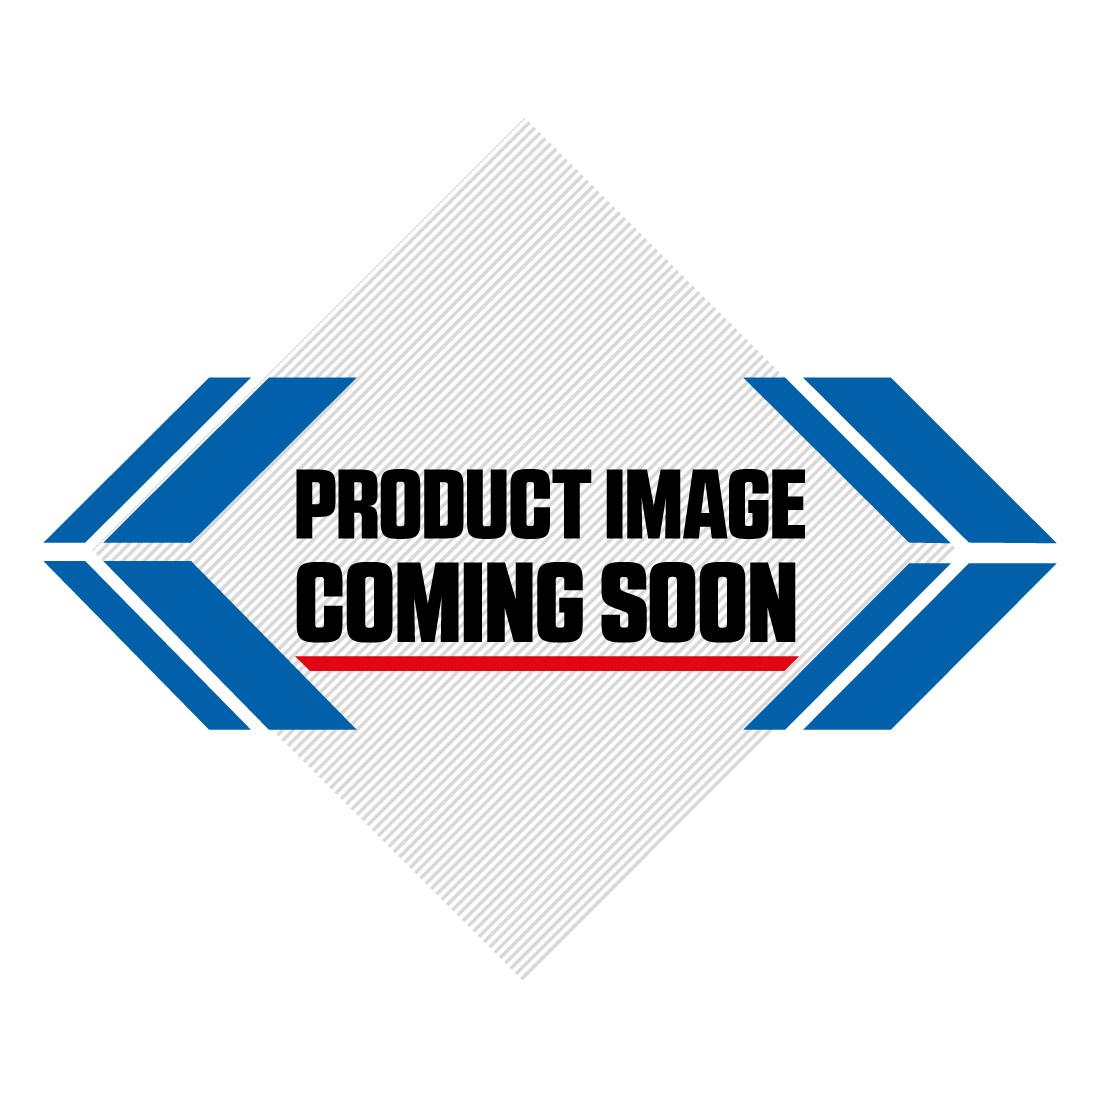 Renthal Twinring Rear Sprocket Kawasaki KX KXF KDX KLX Suzuki RMZ - Green Image-1